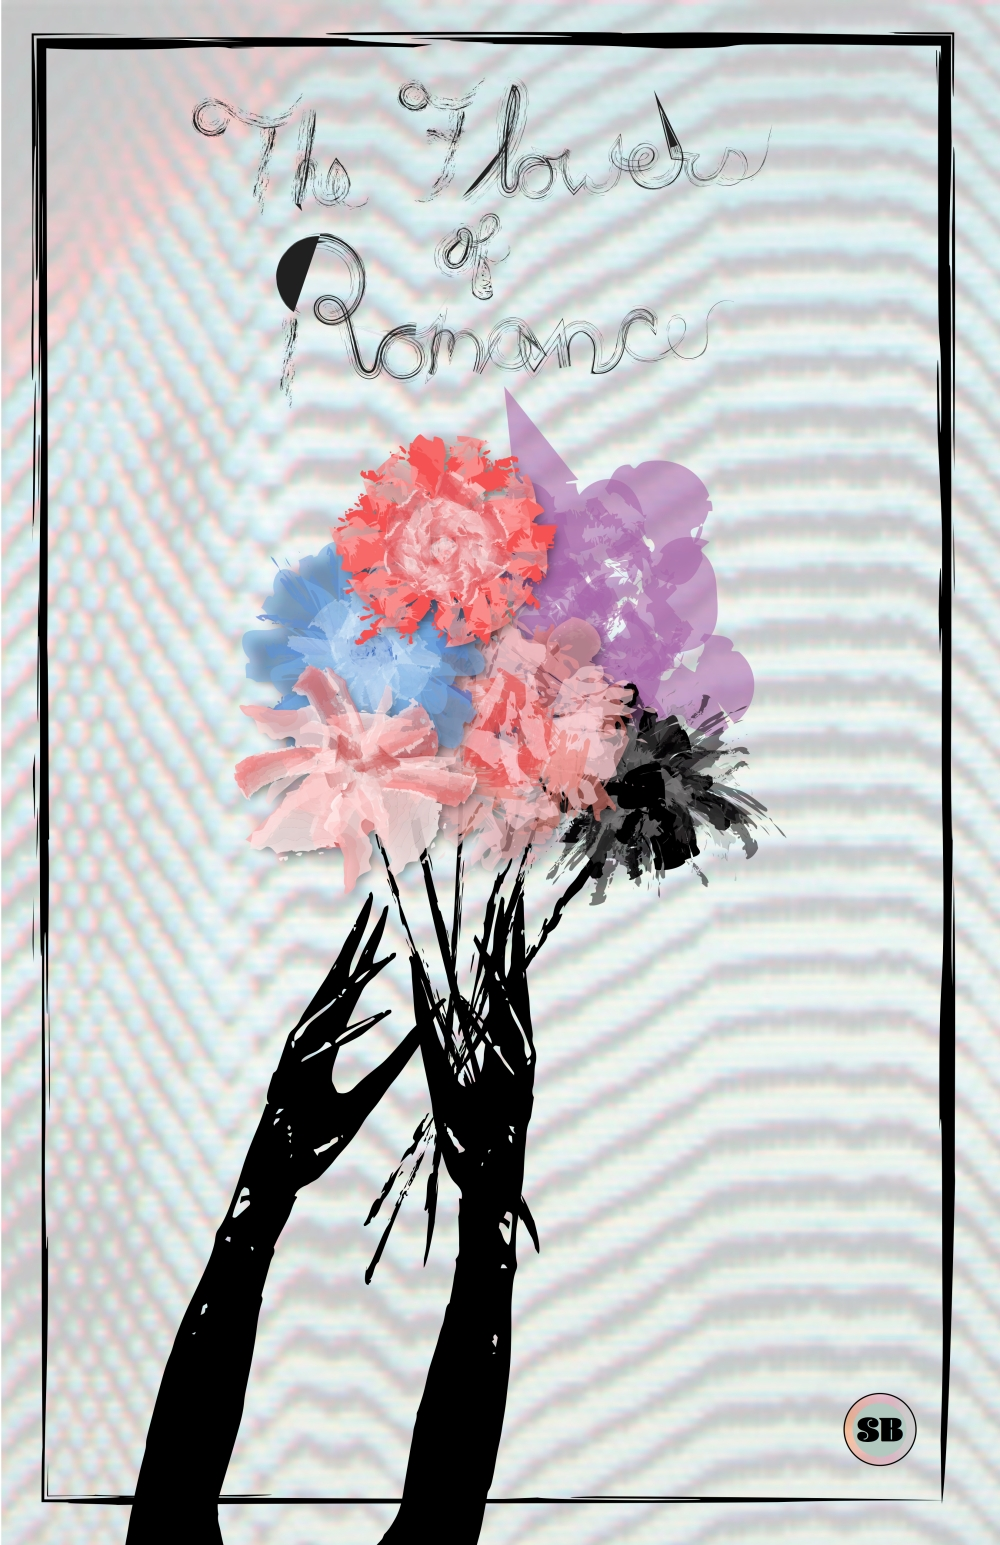 flowers of romance copy